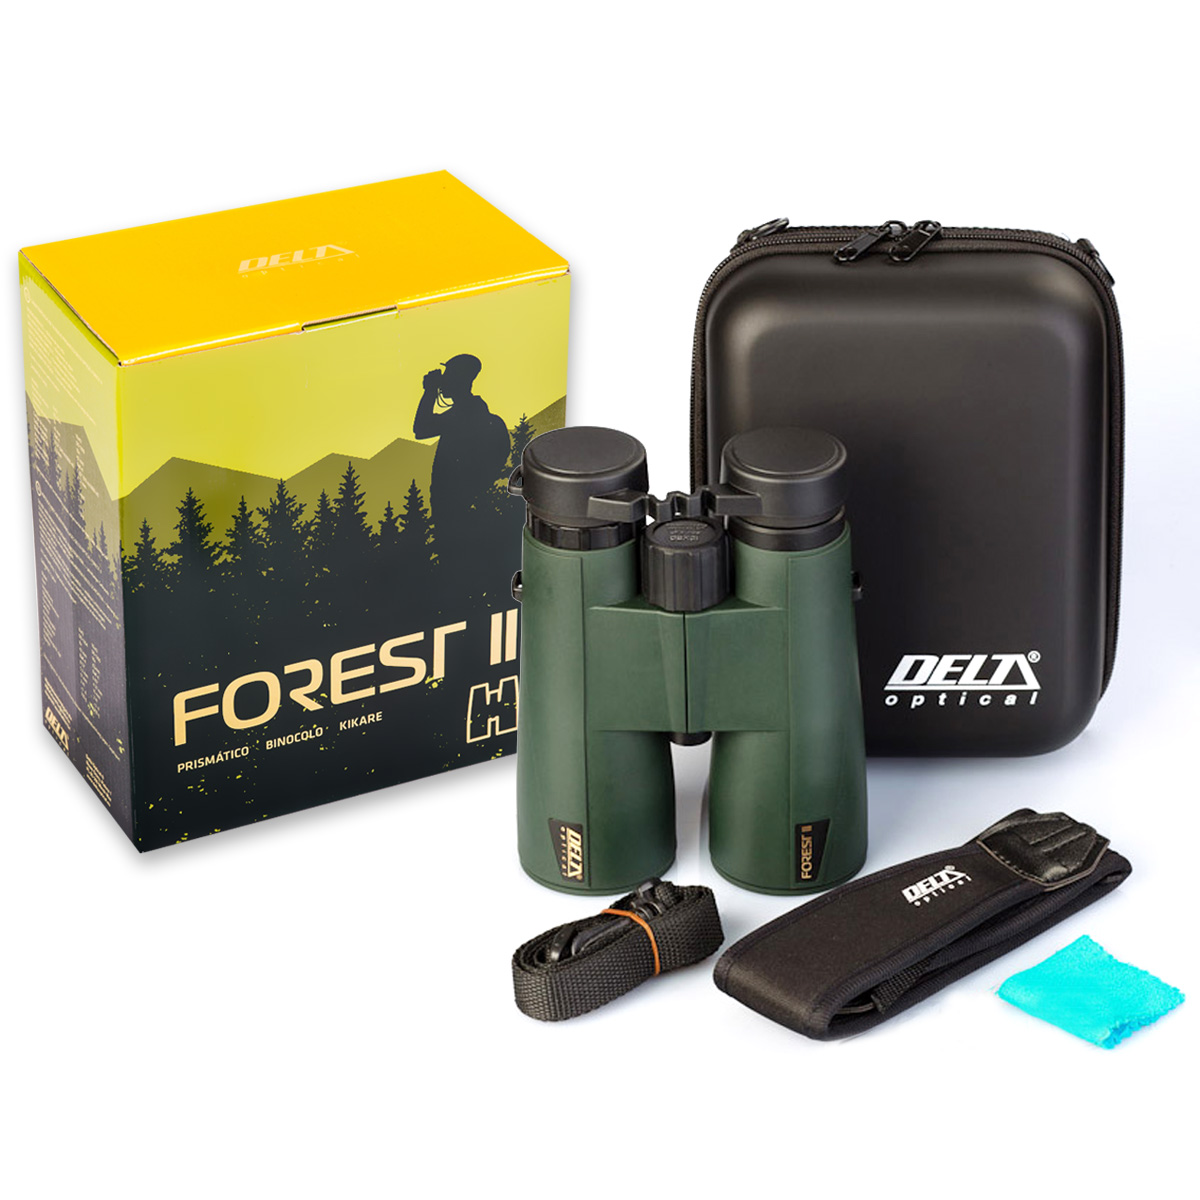 Binoculars Delta Optical Forest II 8x42 Vodotesný